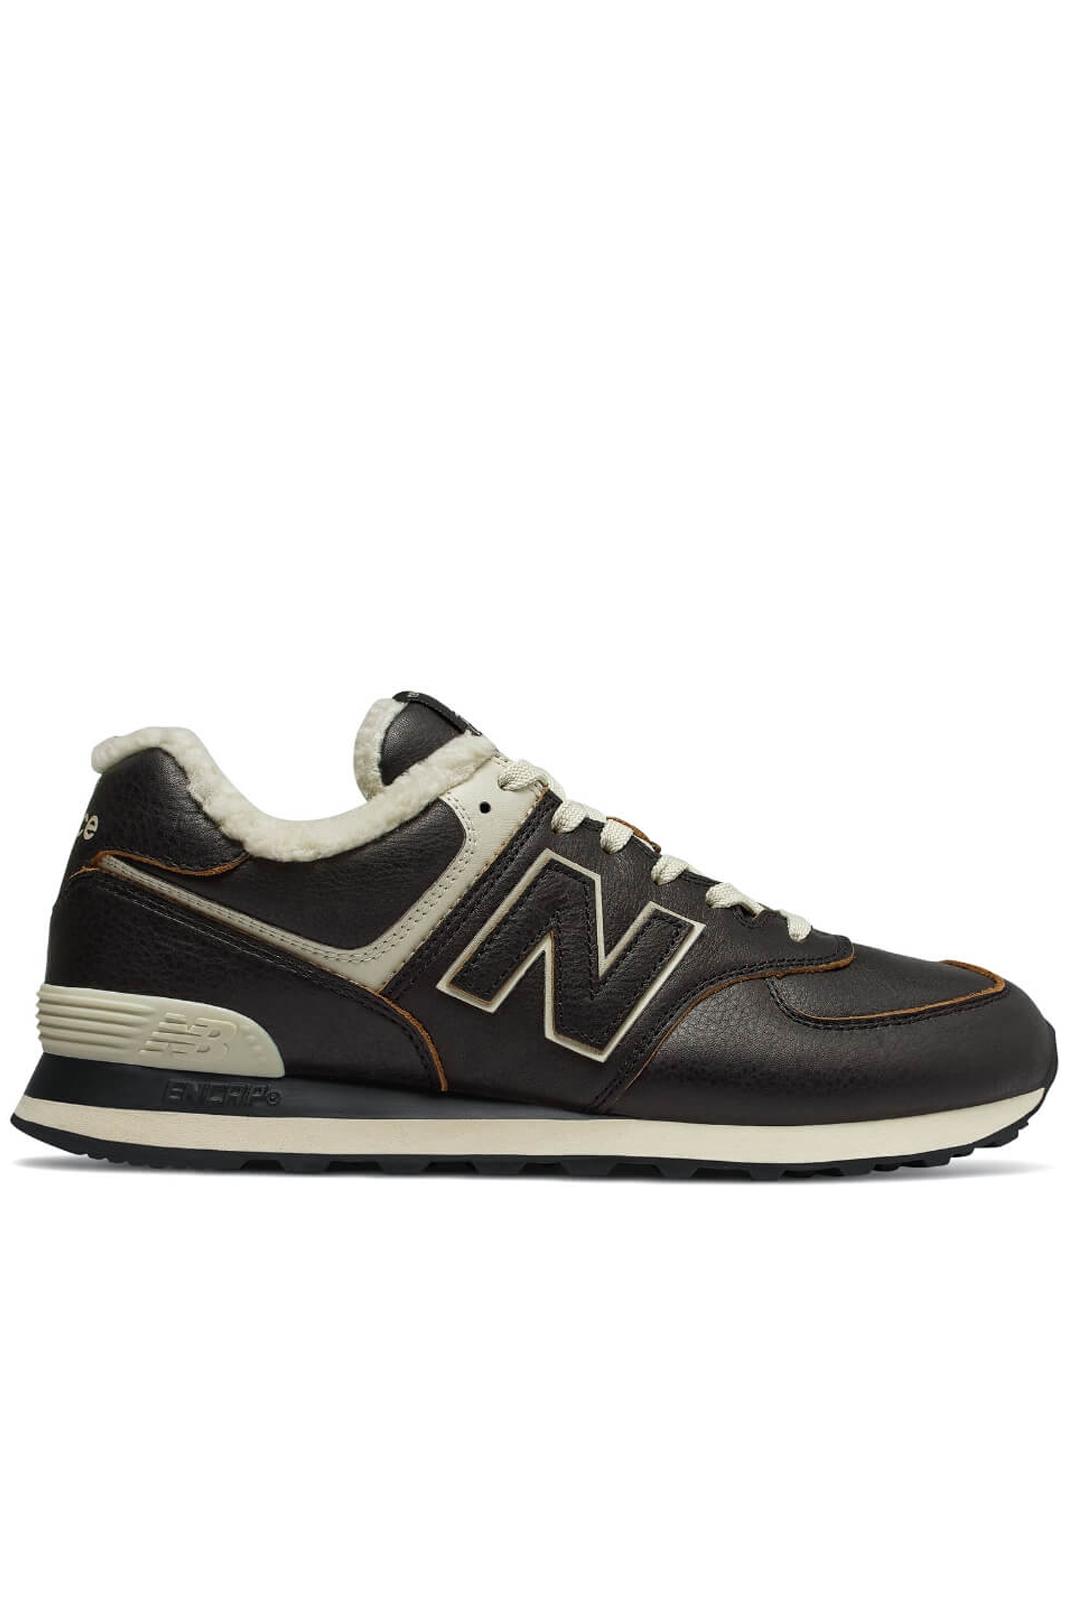 Baskets / Sport  New balance ML574WNE NOIR MARRON